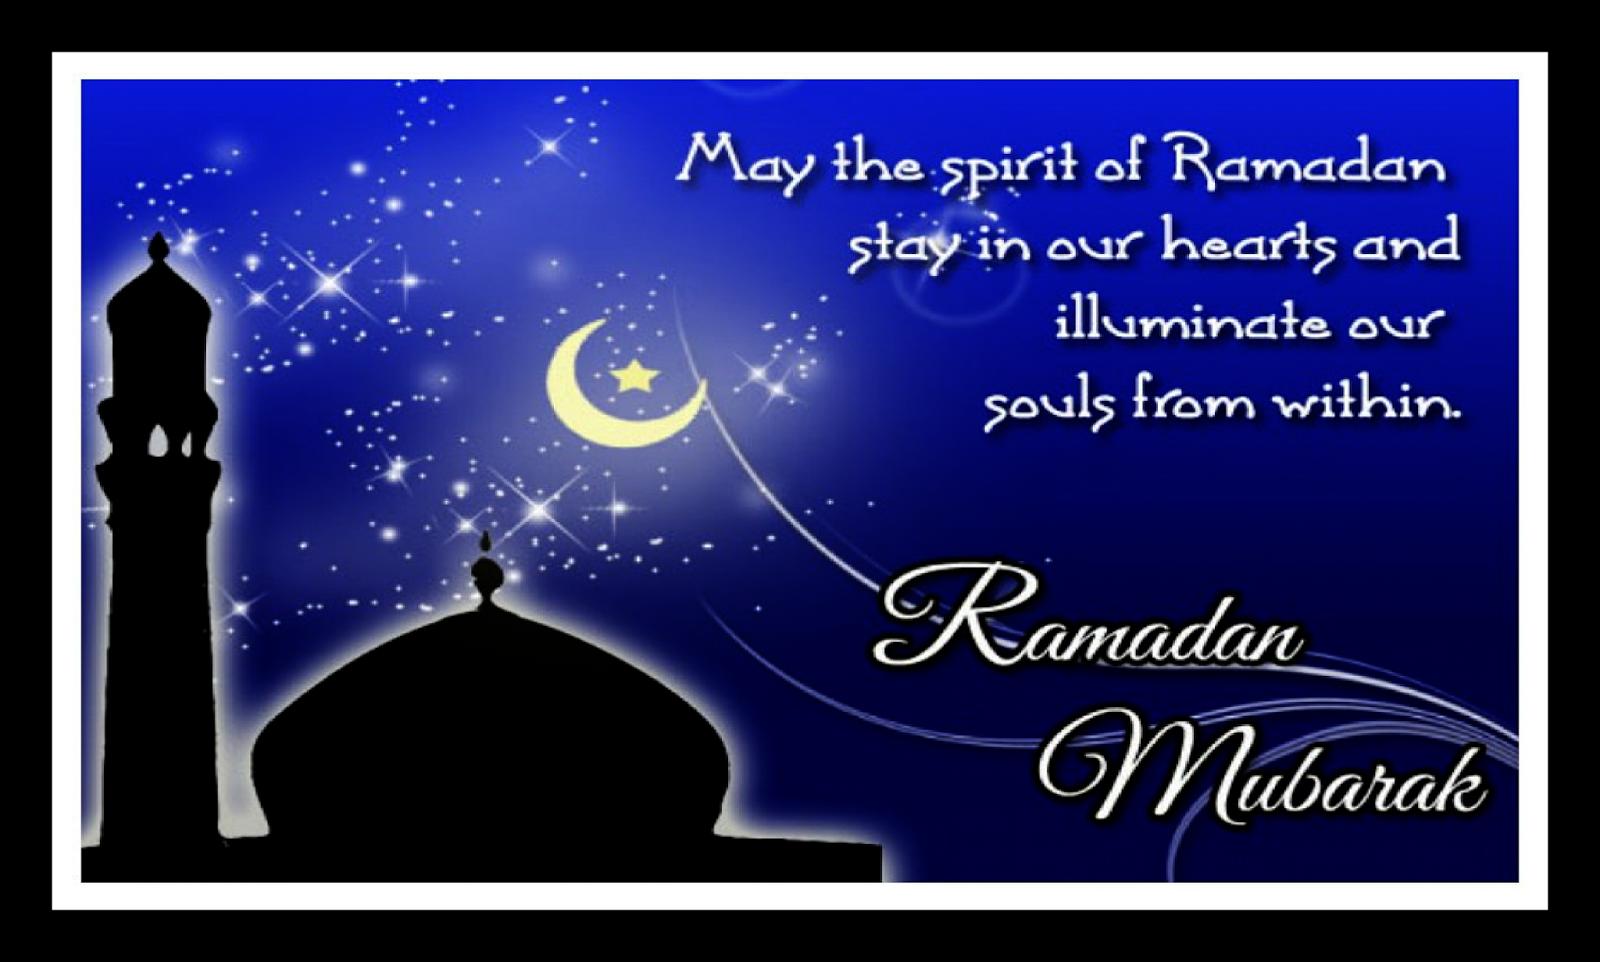 Ramadan mubarak kareem 2017 images hd wallpapers free download ramadan mubarak images free download kristyandbryce Choice Image